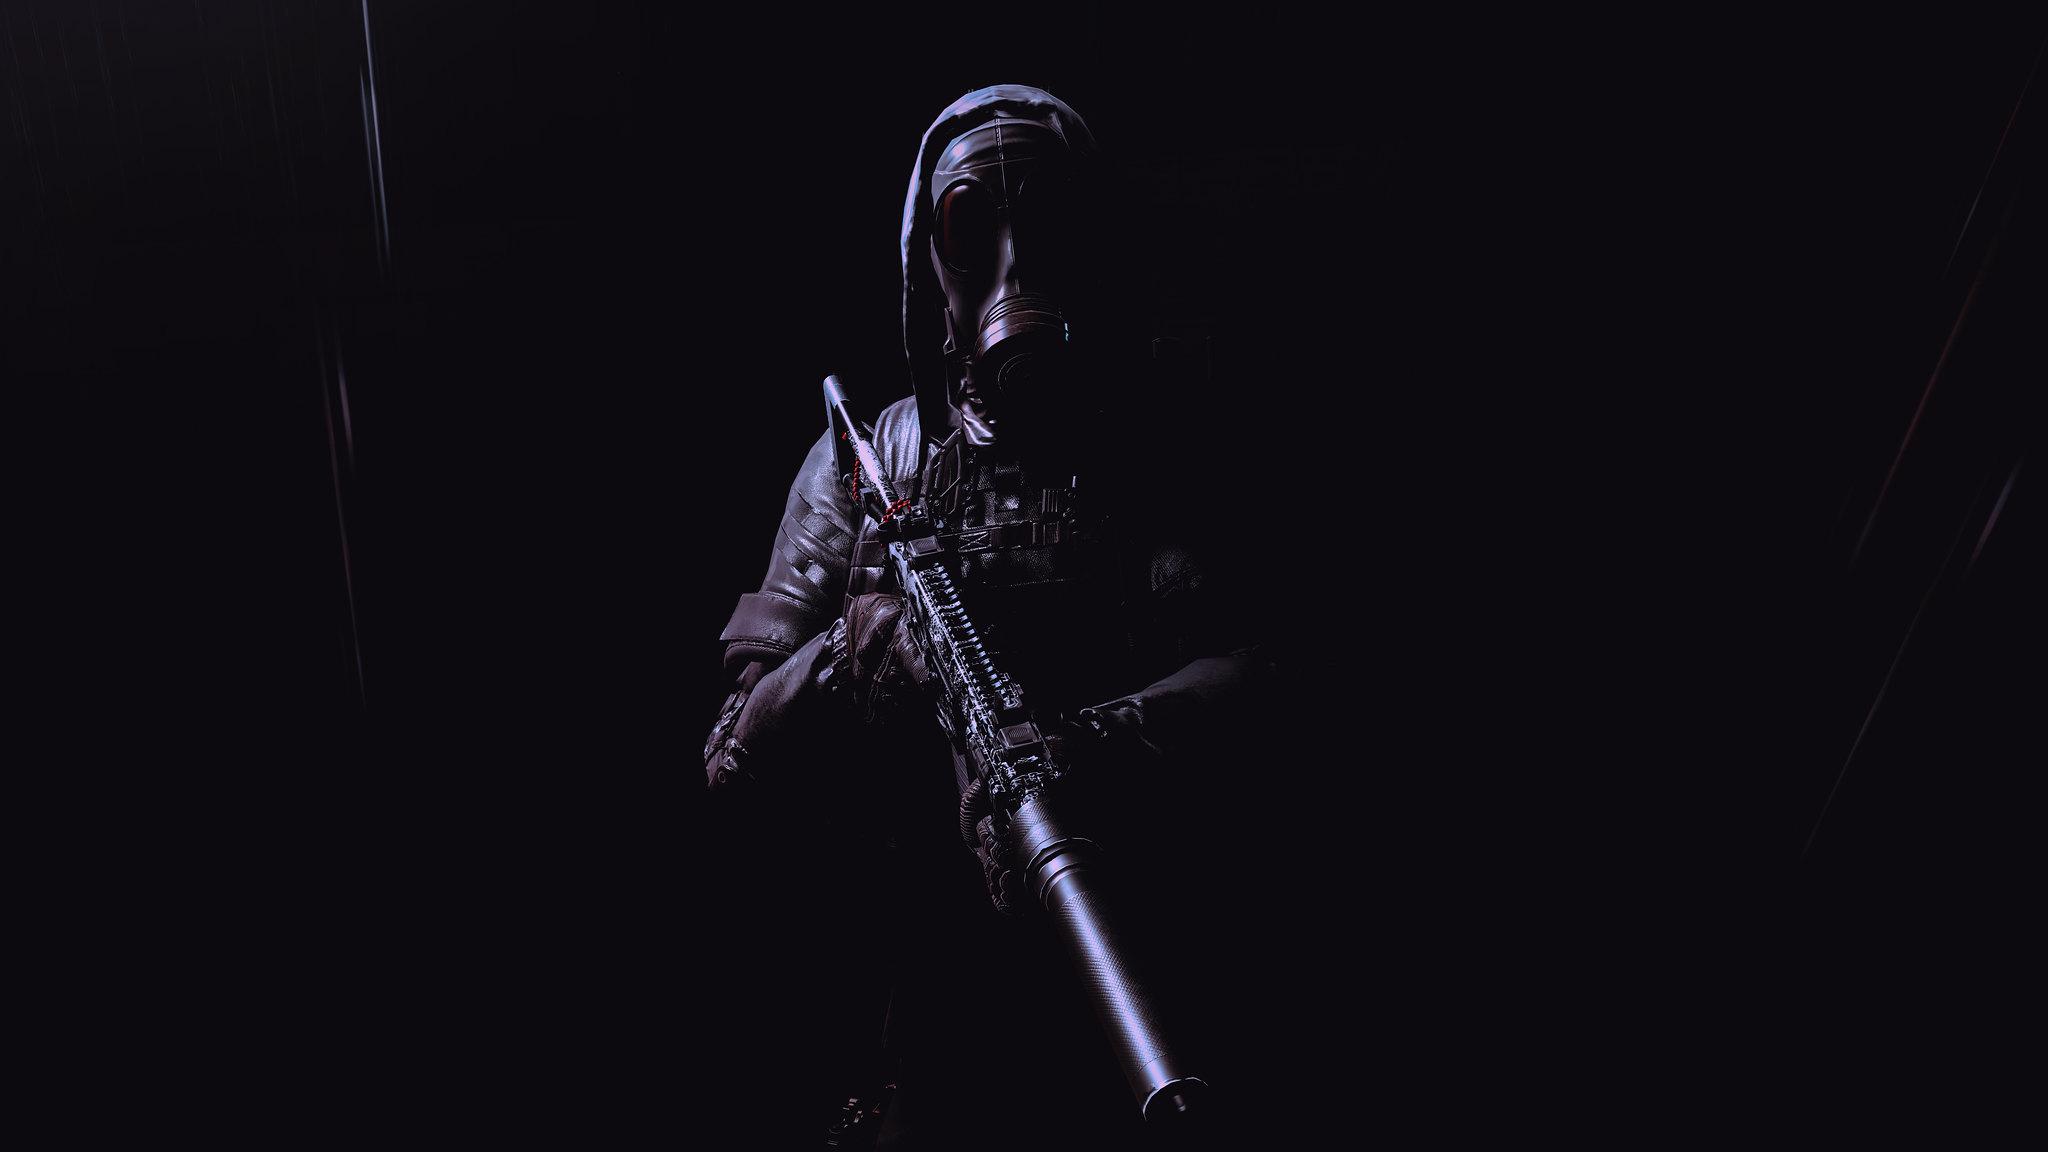 49252006188_8c9fdc9176_k.jpg - Tom Clancy's Ghost Recon: Wildlands